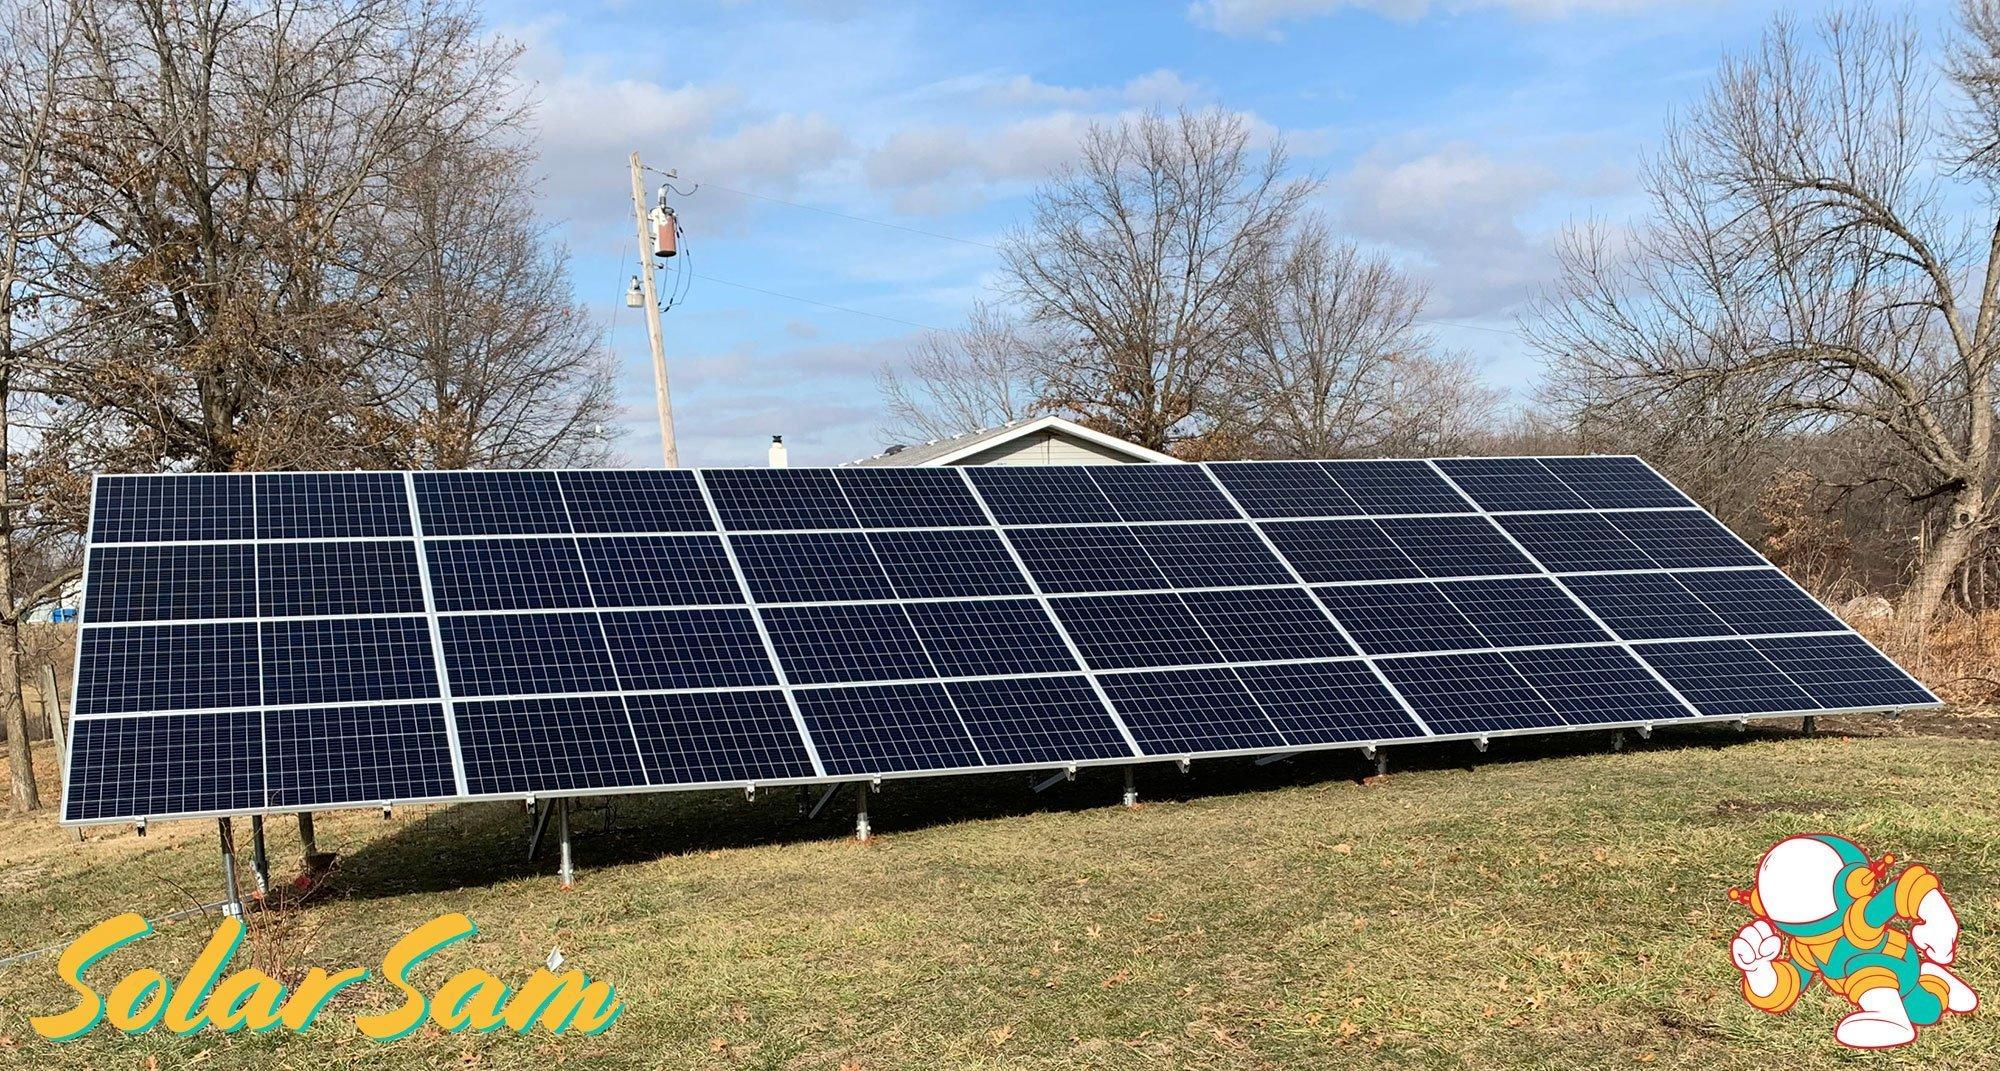 Solar Panels in Centralia, Missouri Installed by Solar Sam Professional Solar Installers using Monocrystalline panels. SMA Inverter. Sunmodo Ground Mount.